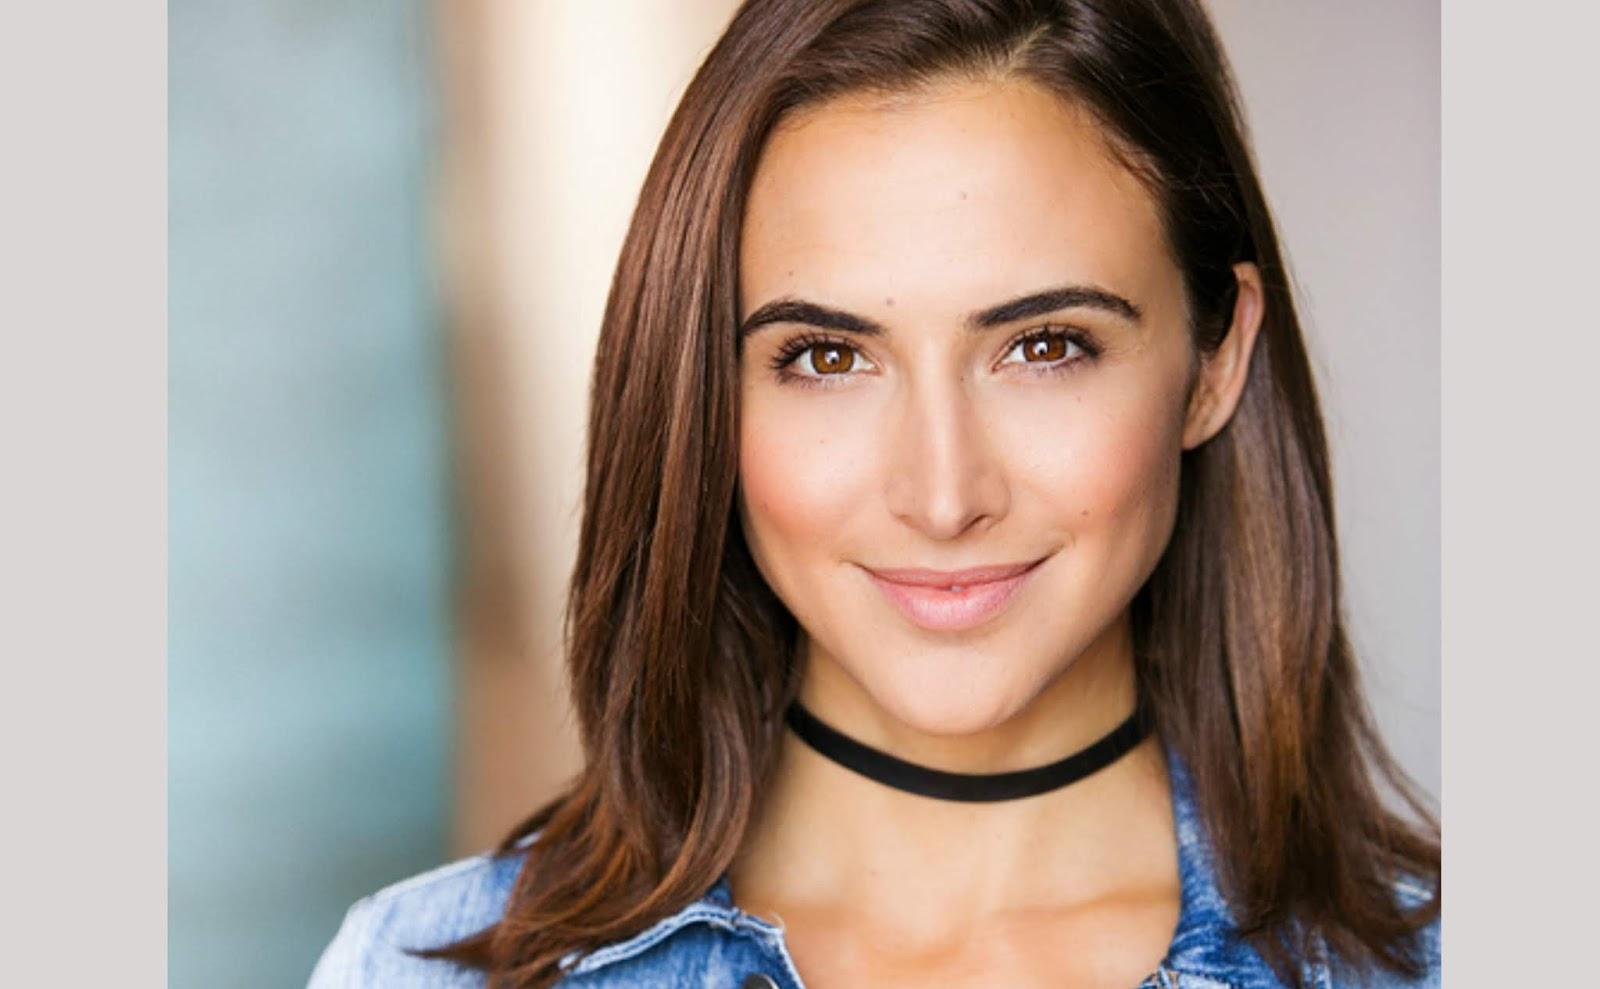 General Hospital News: Introducing Michelle Argyris! | Soap Opera News